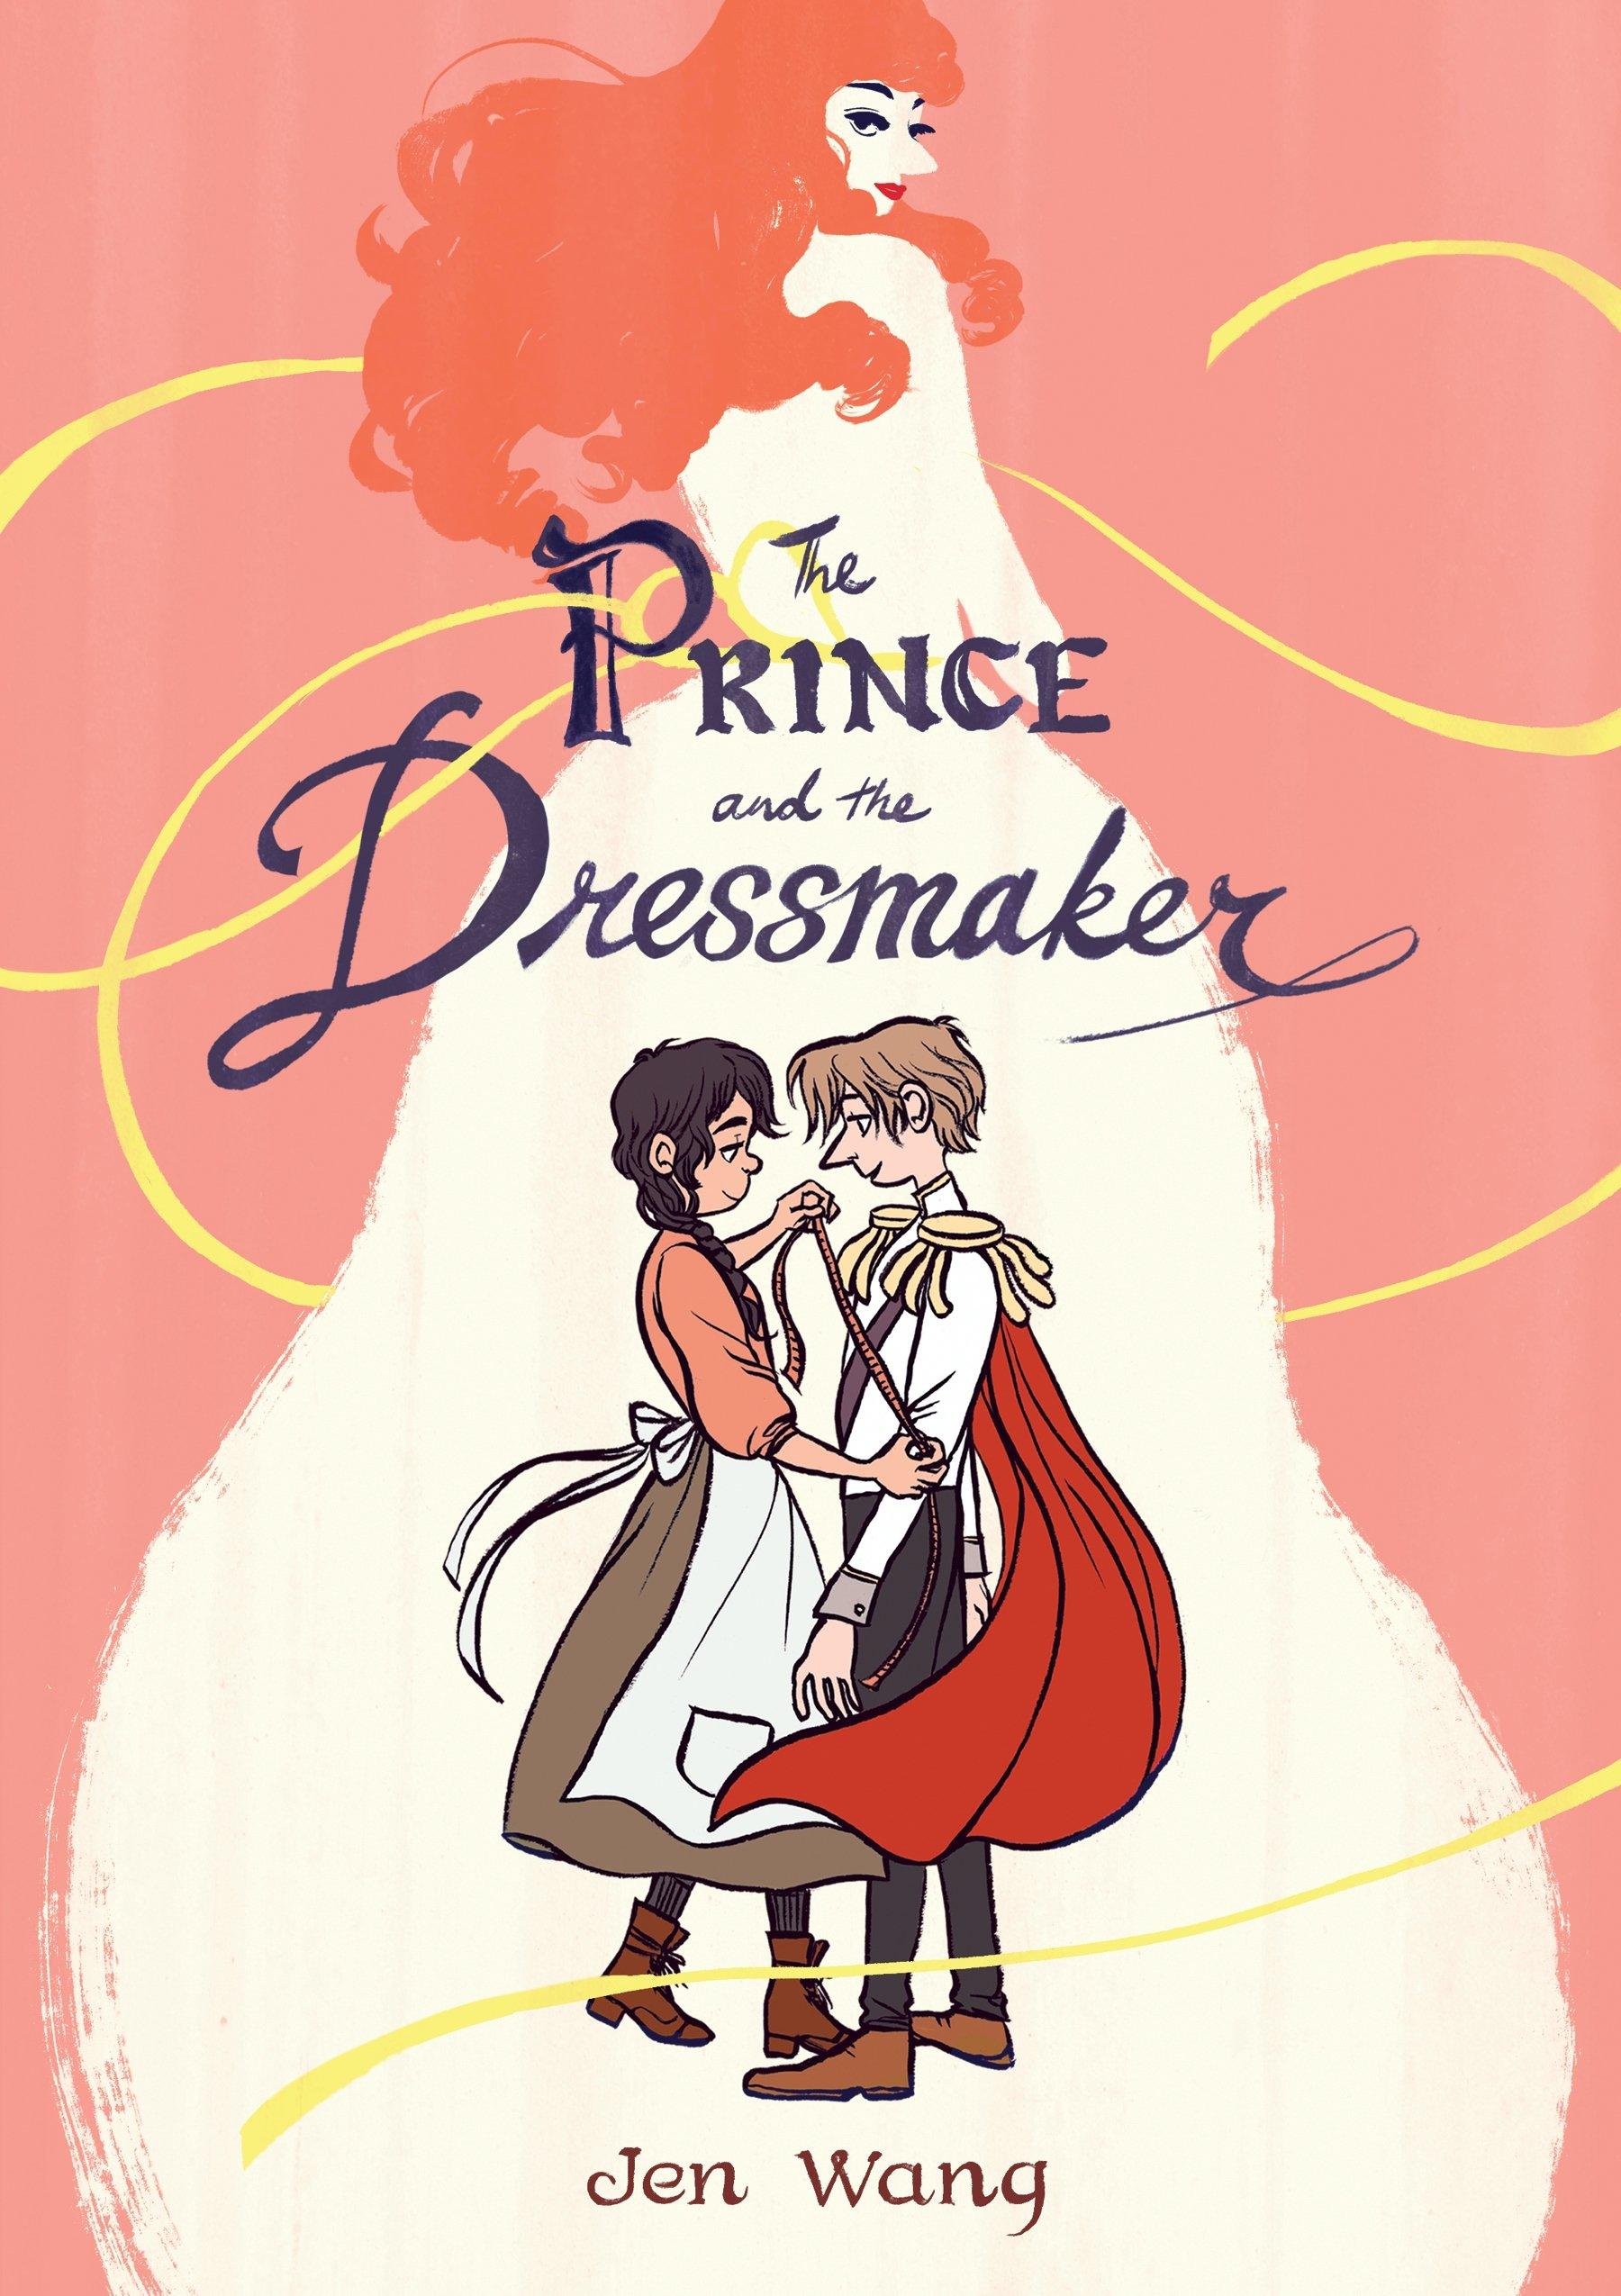 Prince and the Dressmaker.jpg